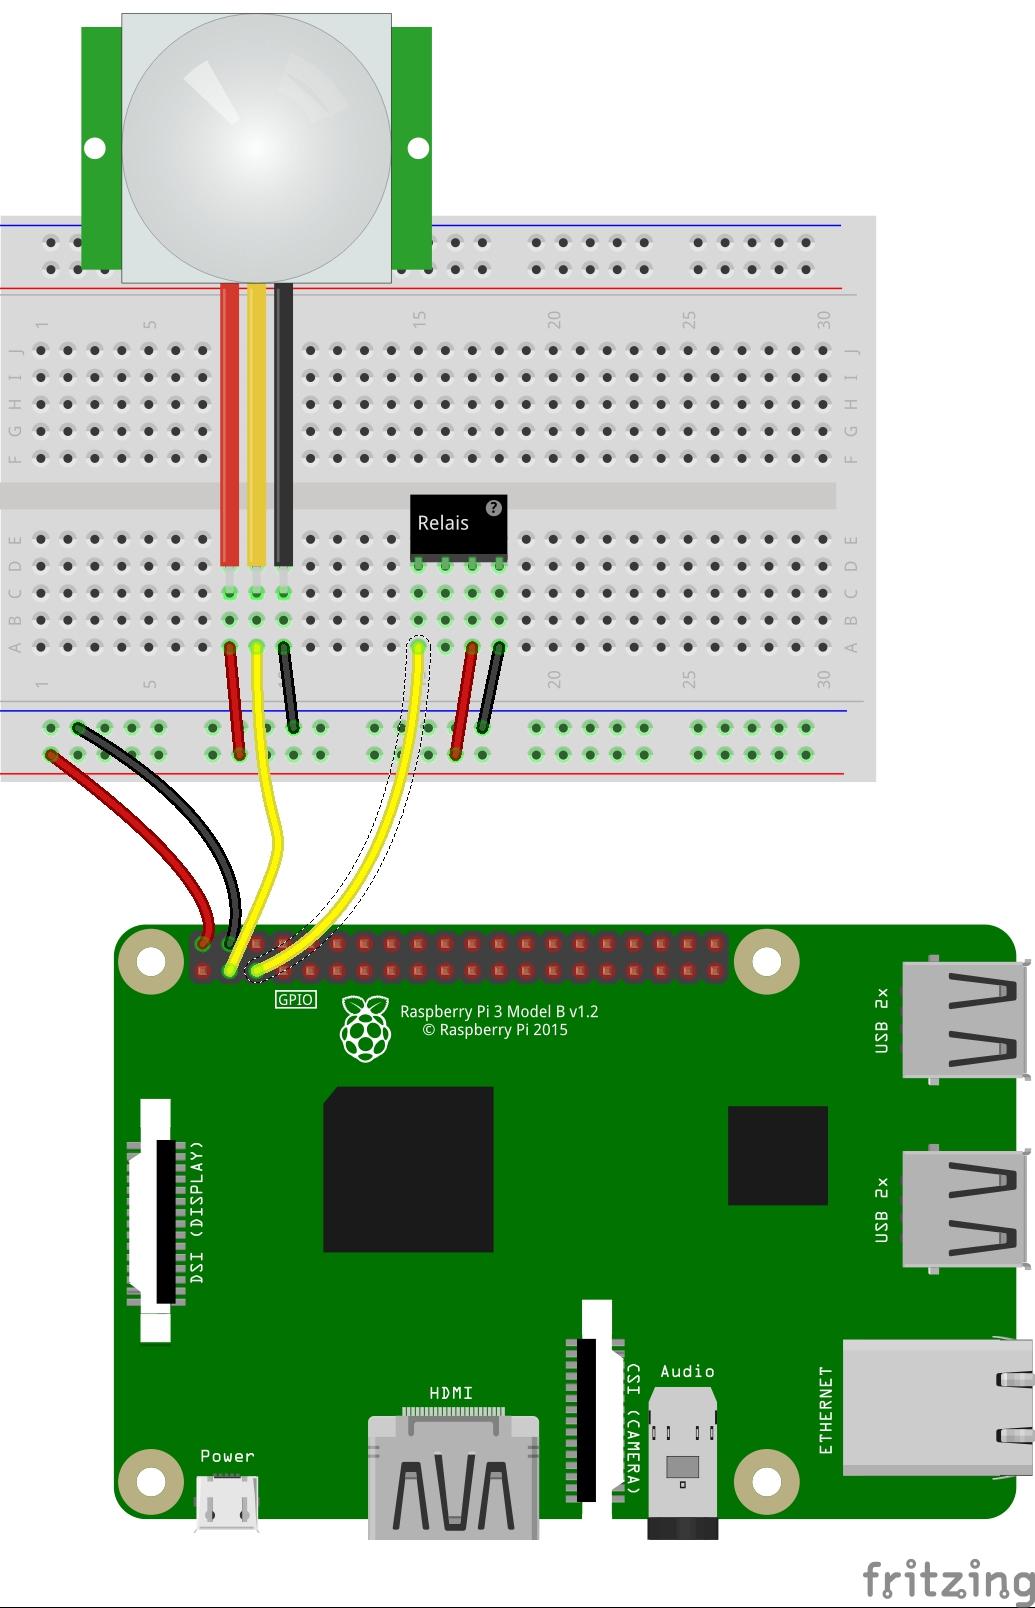 Multimédia center with Raspberry Pi 3 / Projets R & A / Alex